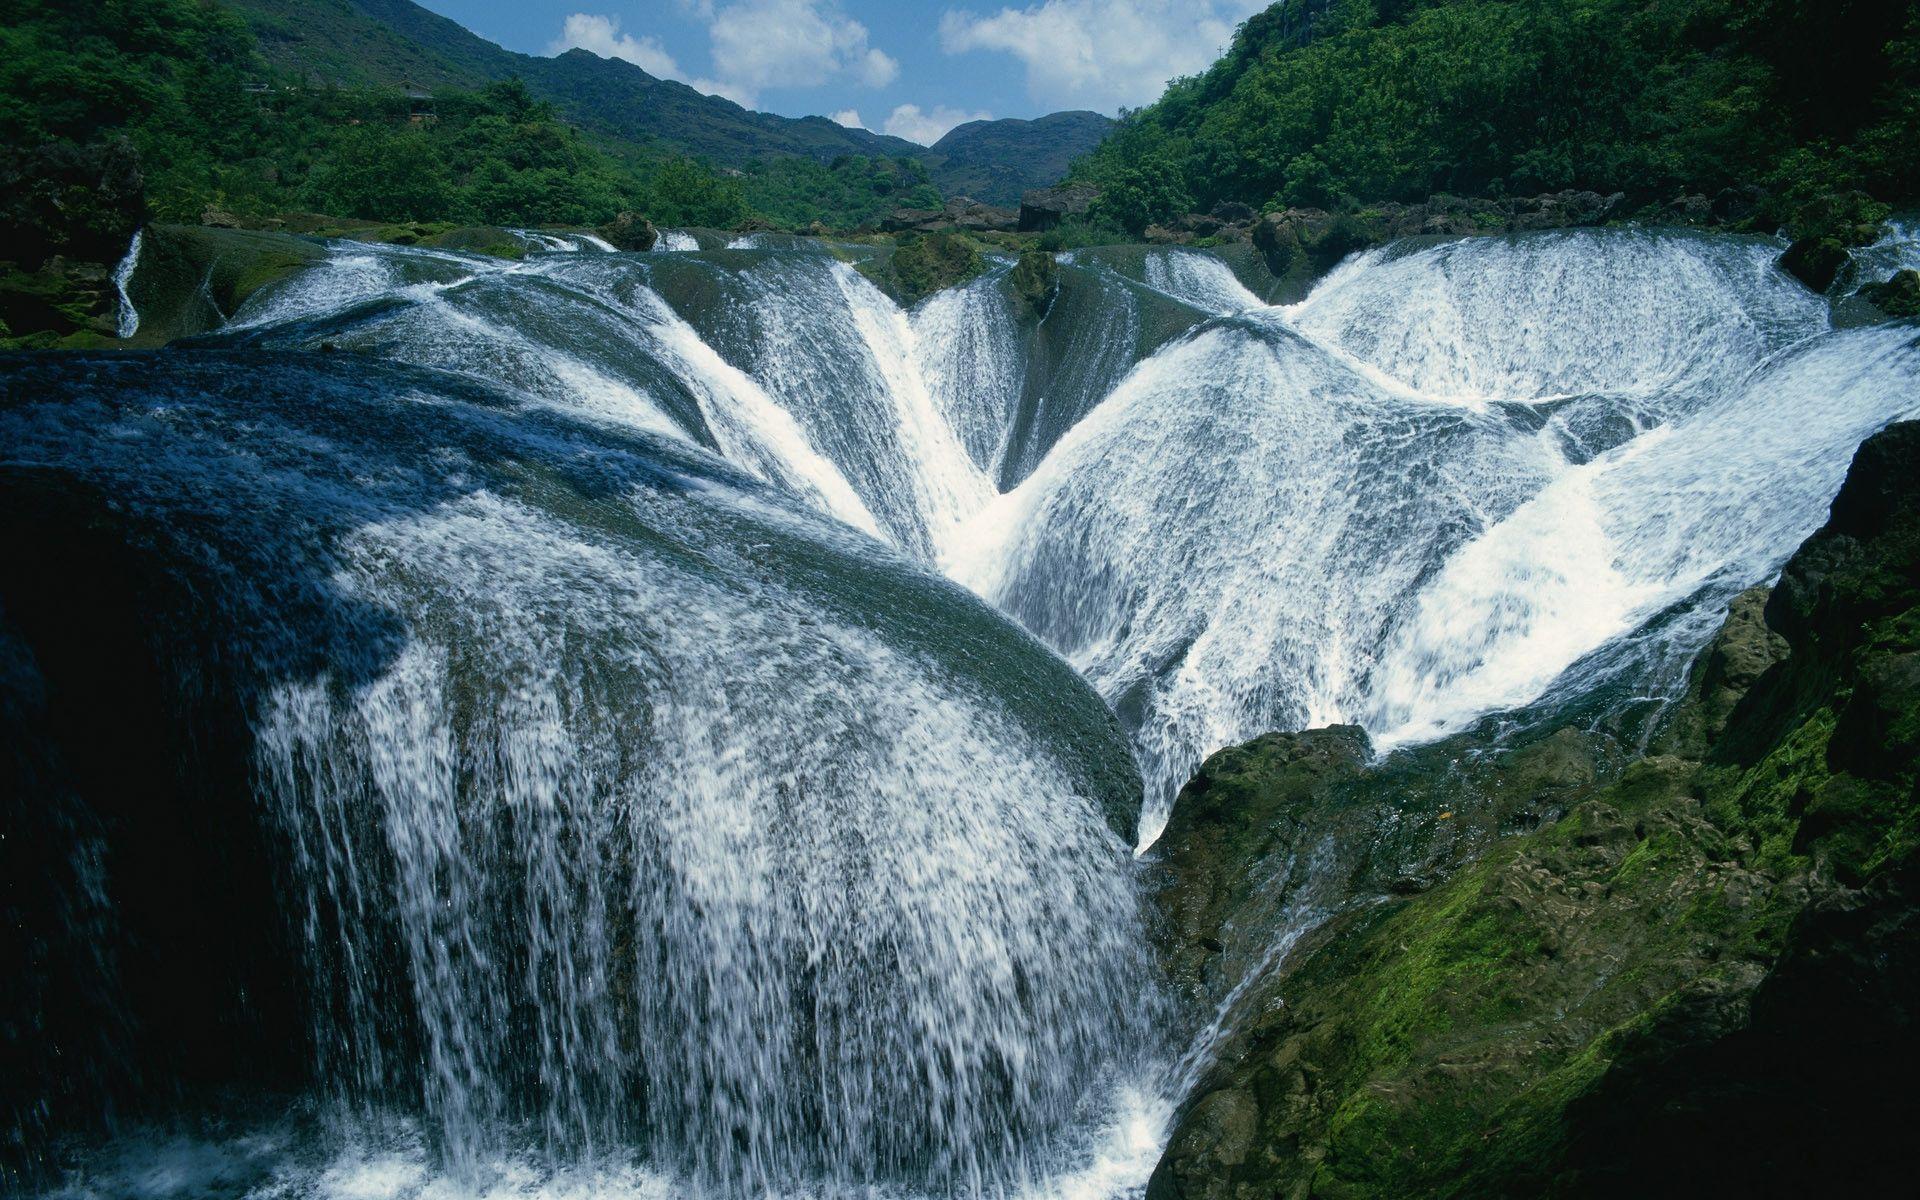 waterfall hd wallpaper waterfall desktop images cool wallpapers